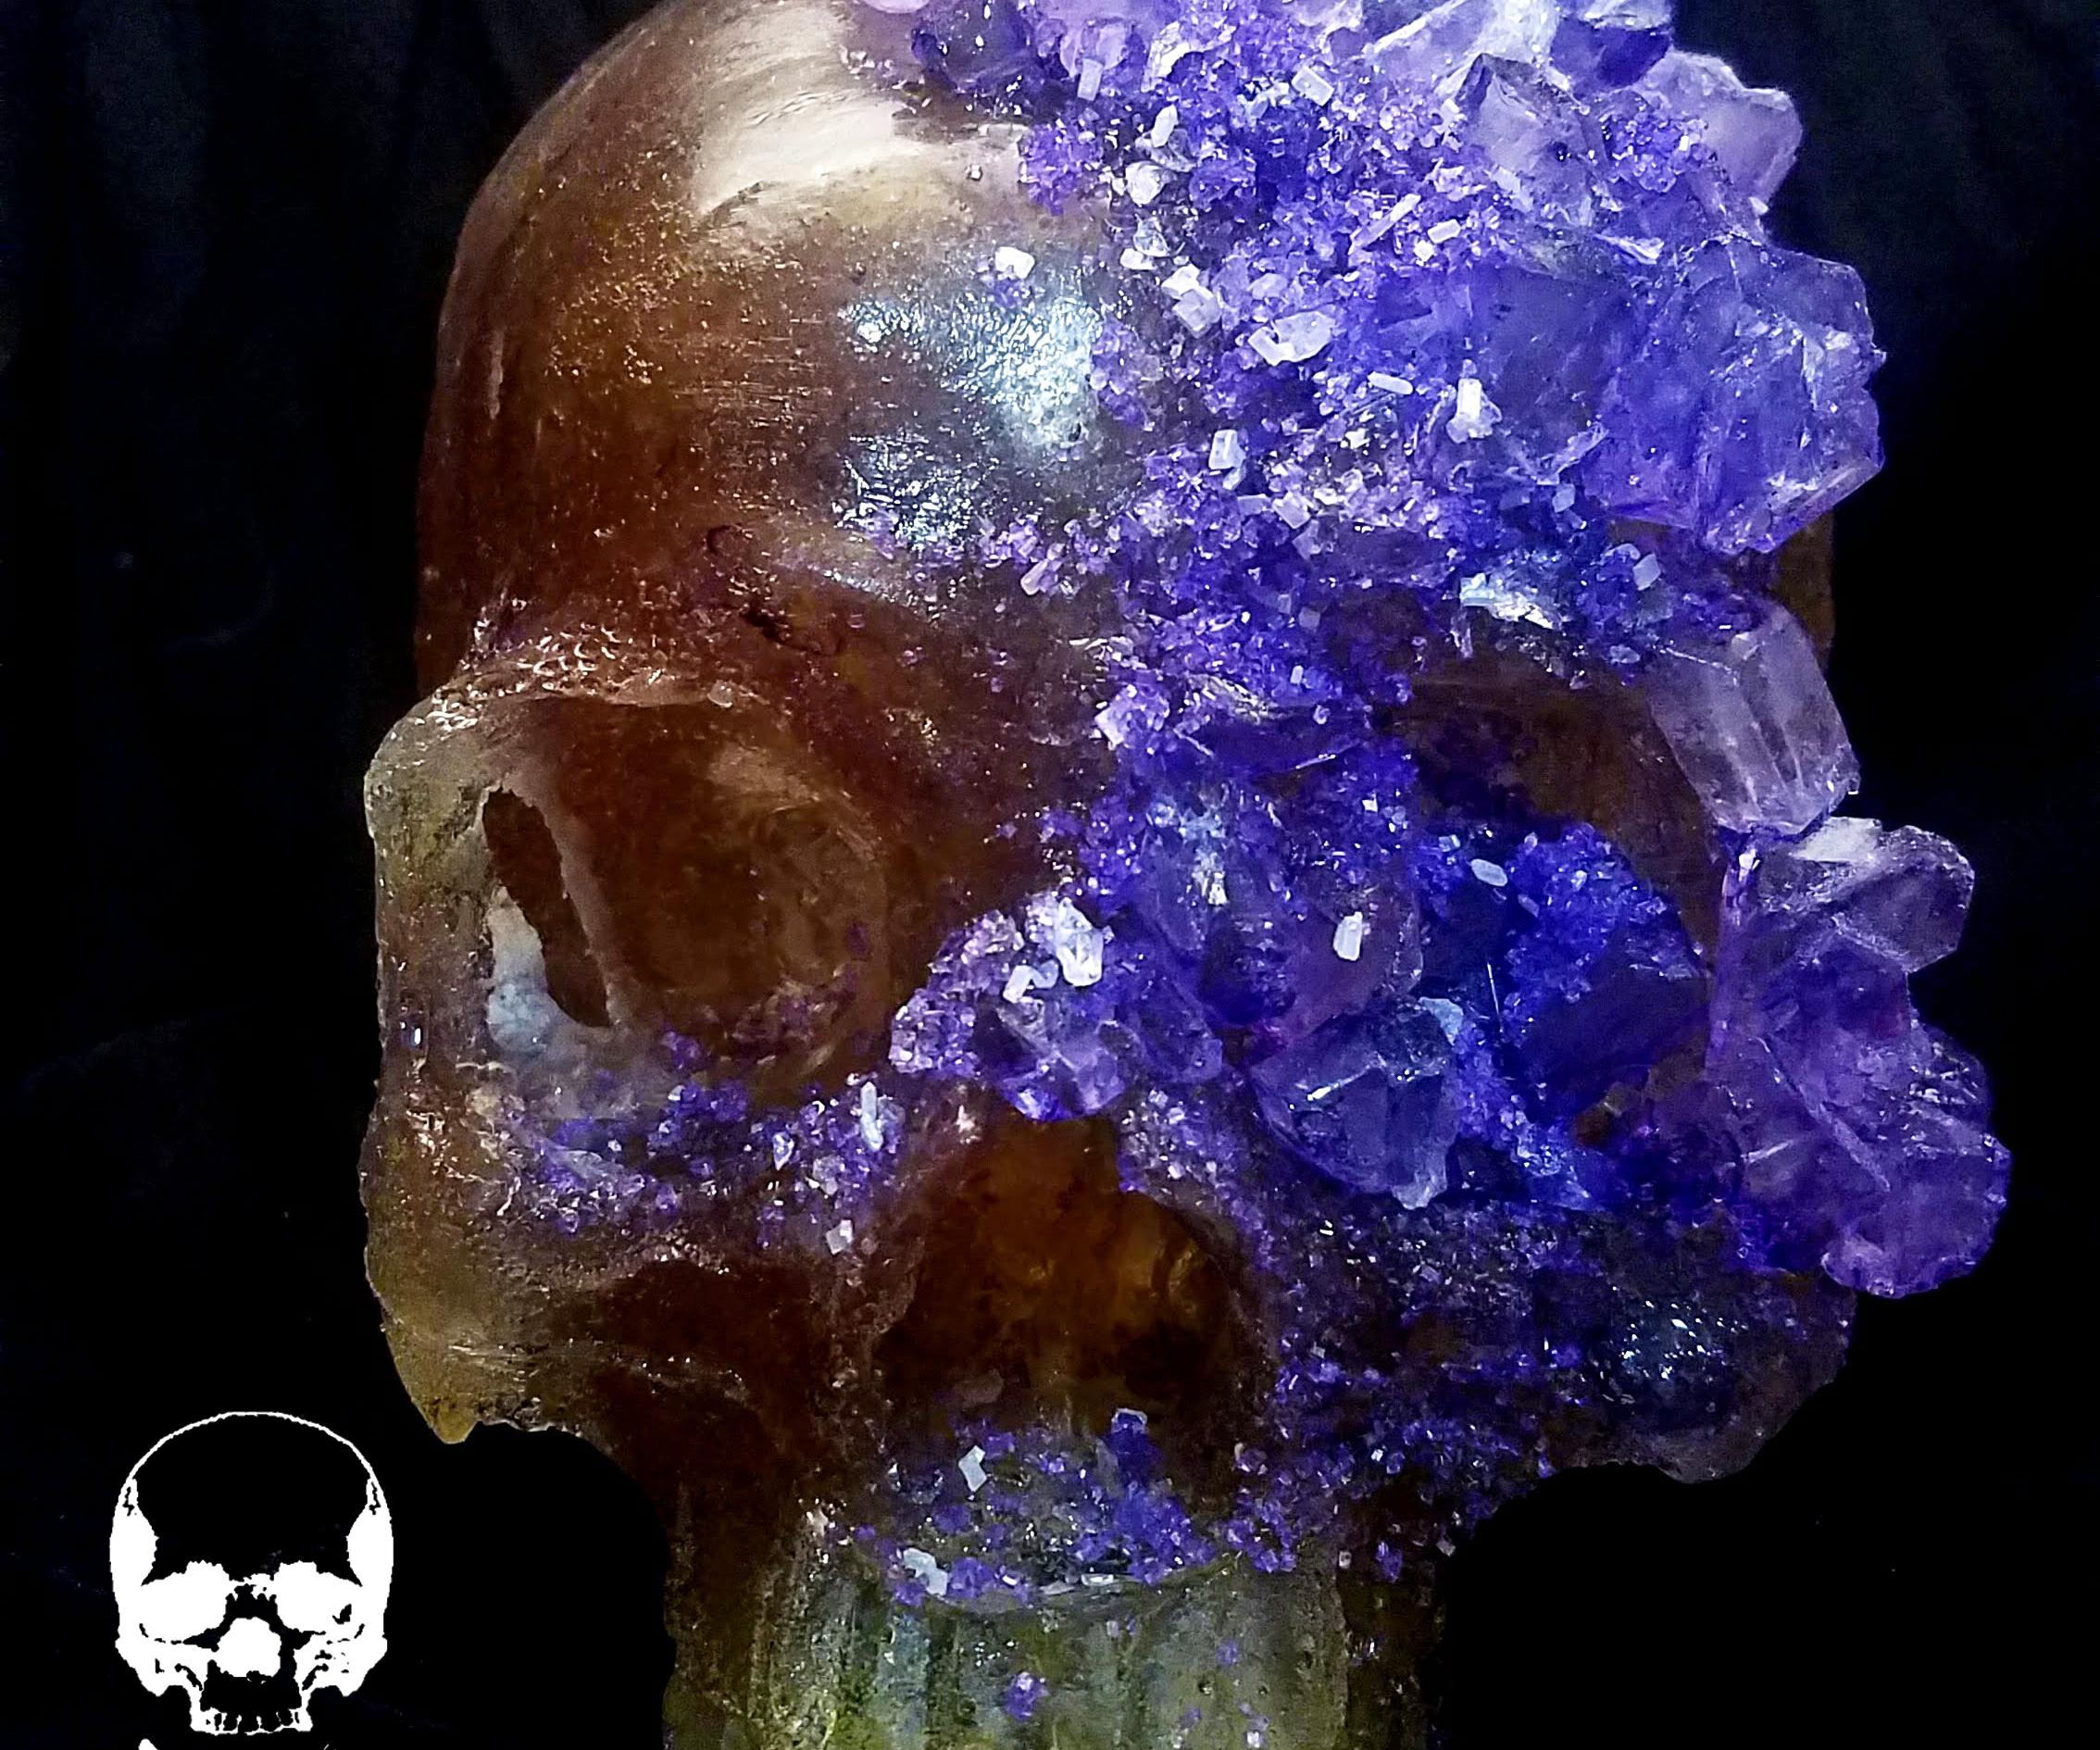 100% Edible Life Sized Violet Crystal Encrusted Sugar Skull